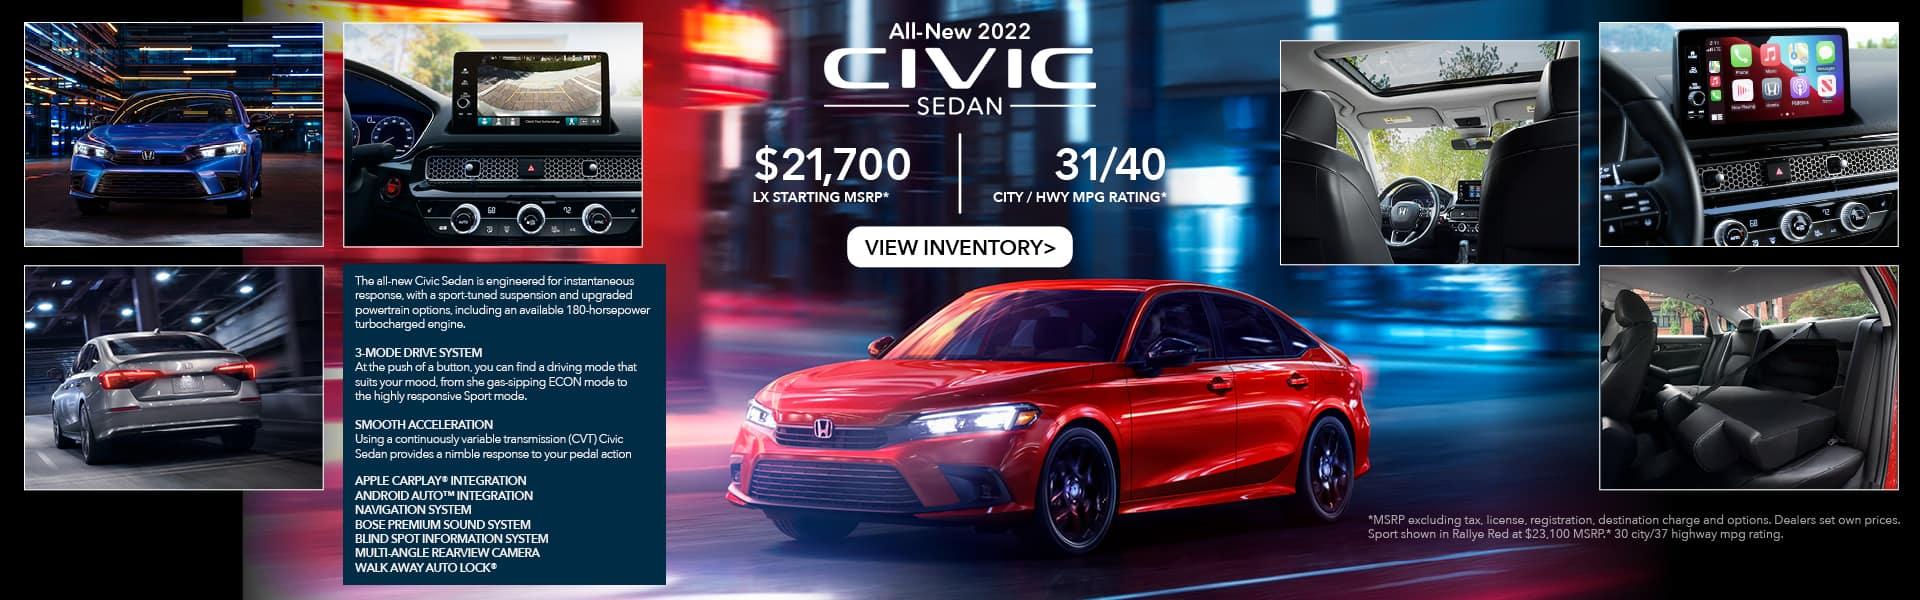 2022 CIVIC